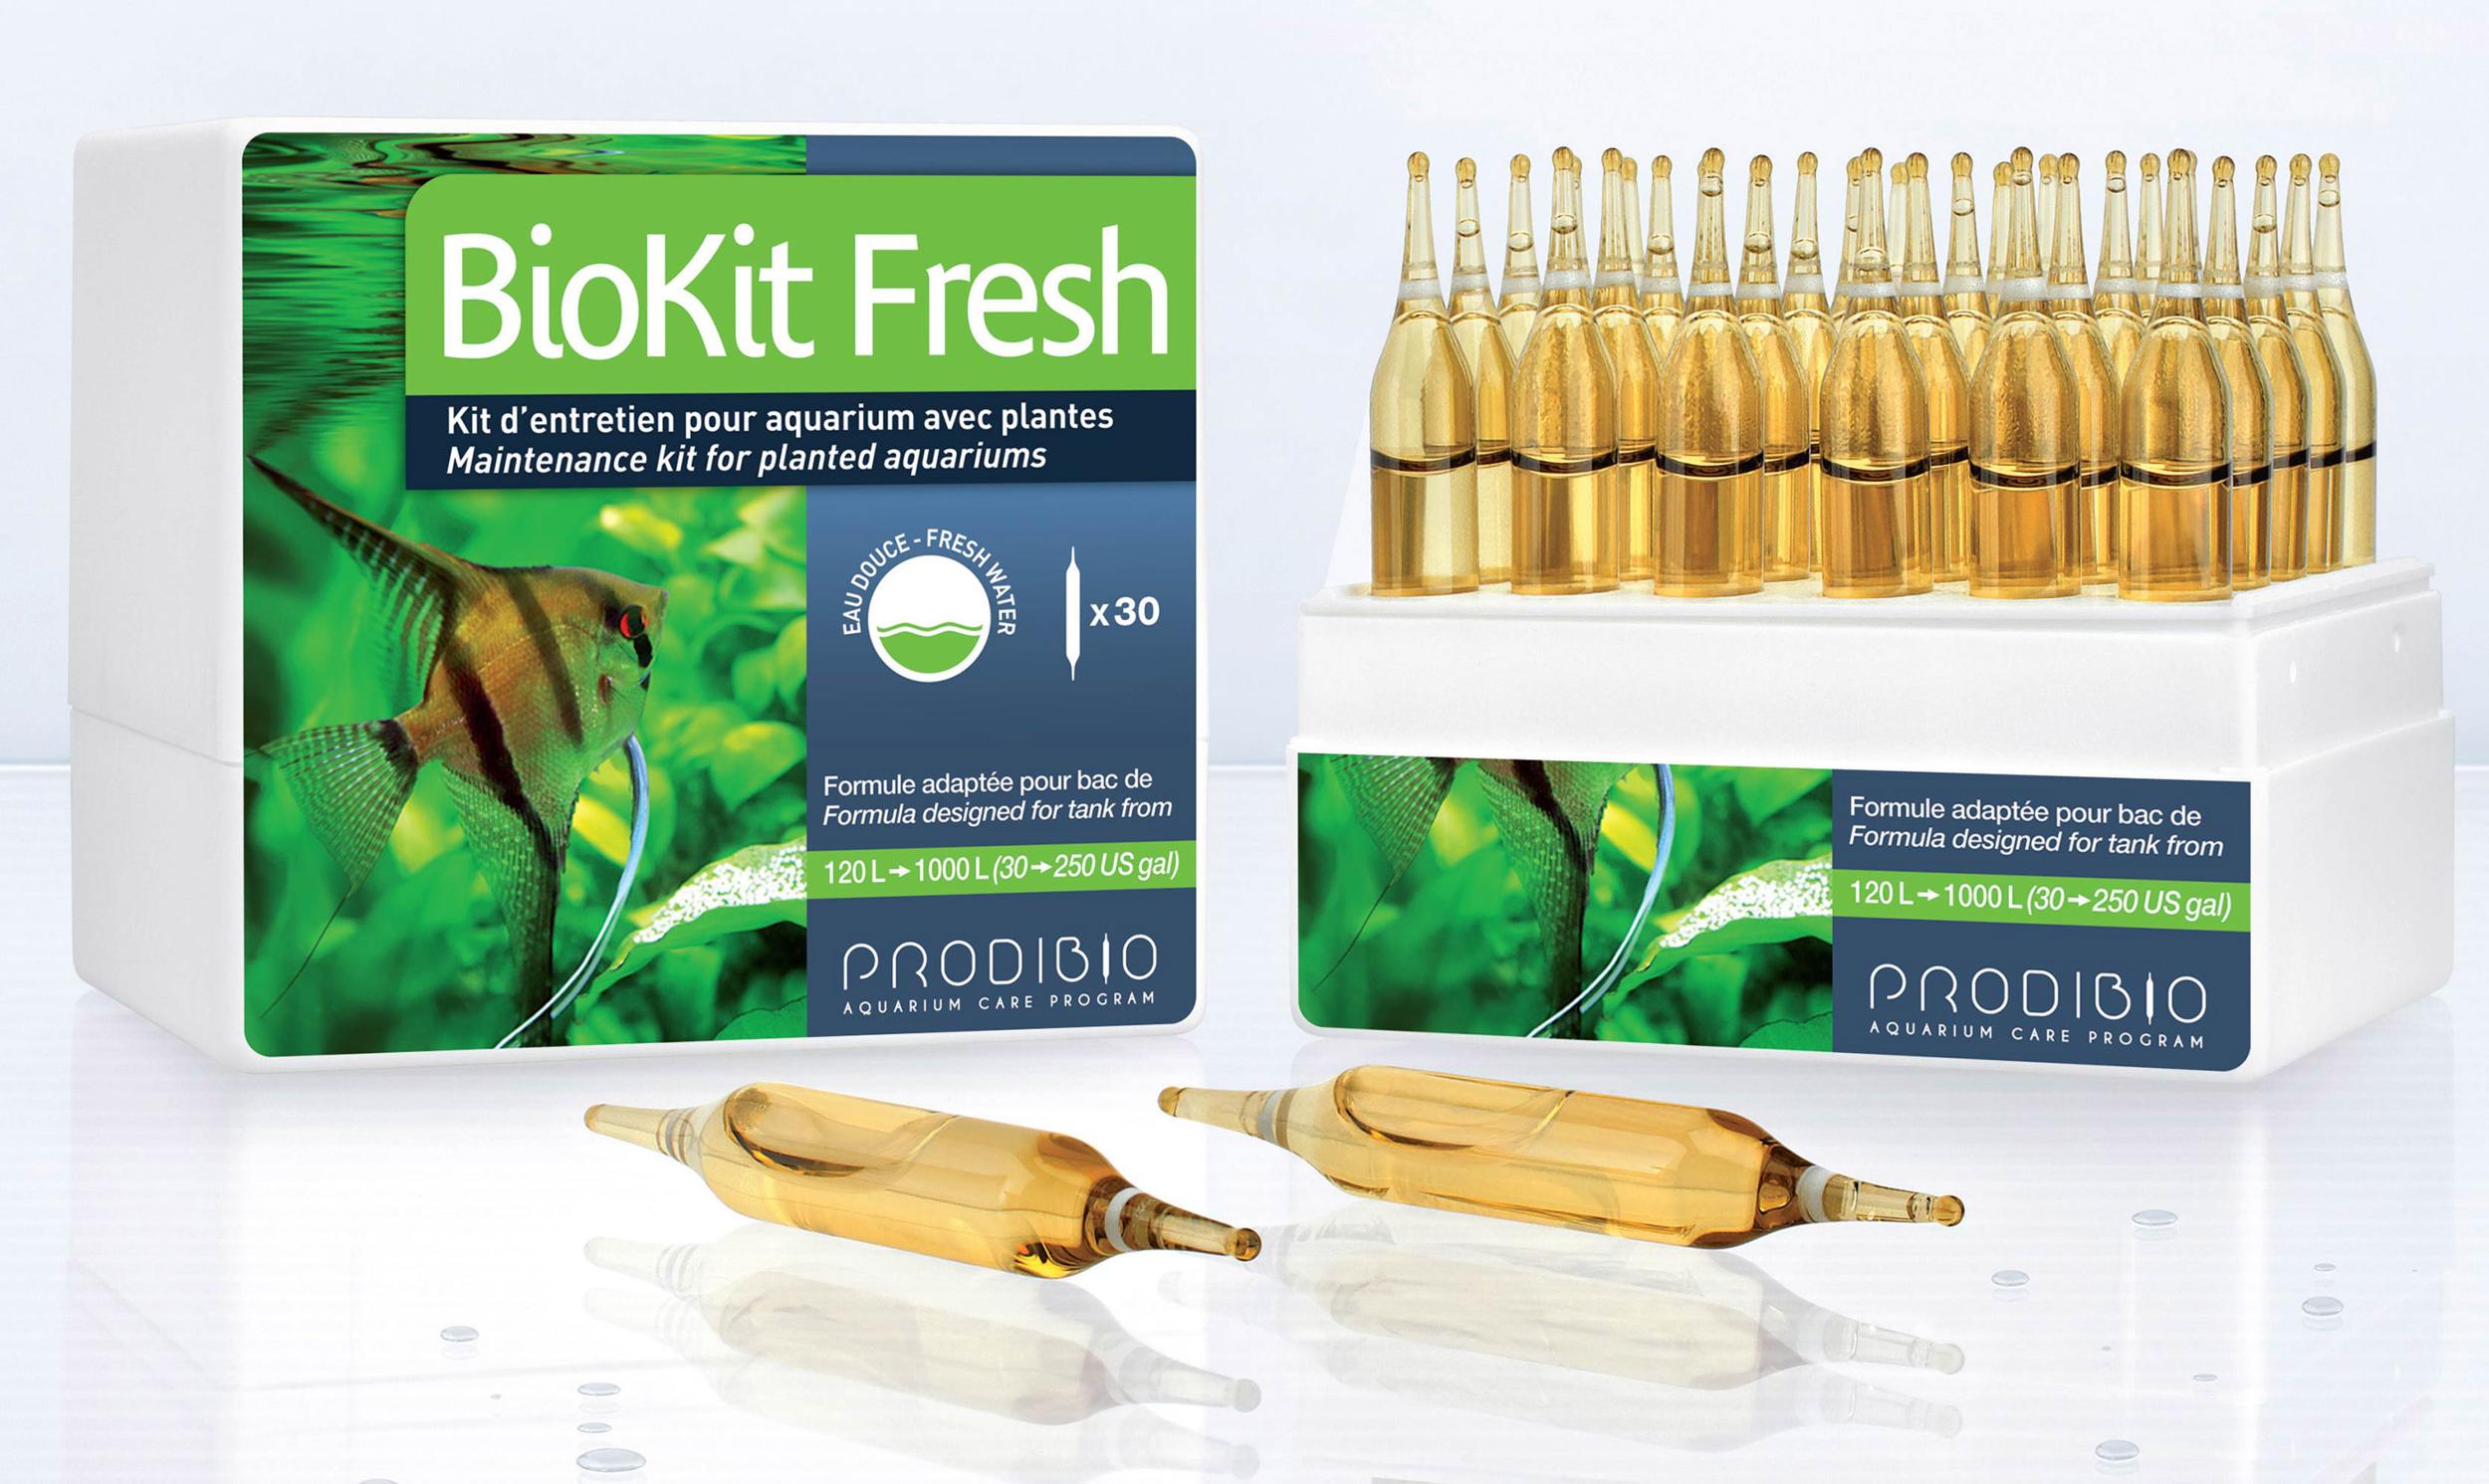 biot_kit_fresh_-_30_-_prodibio